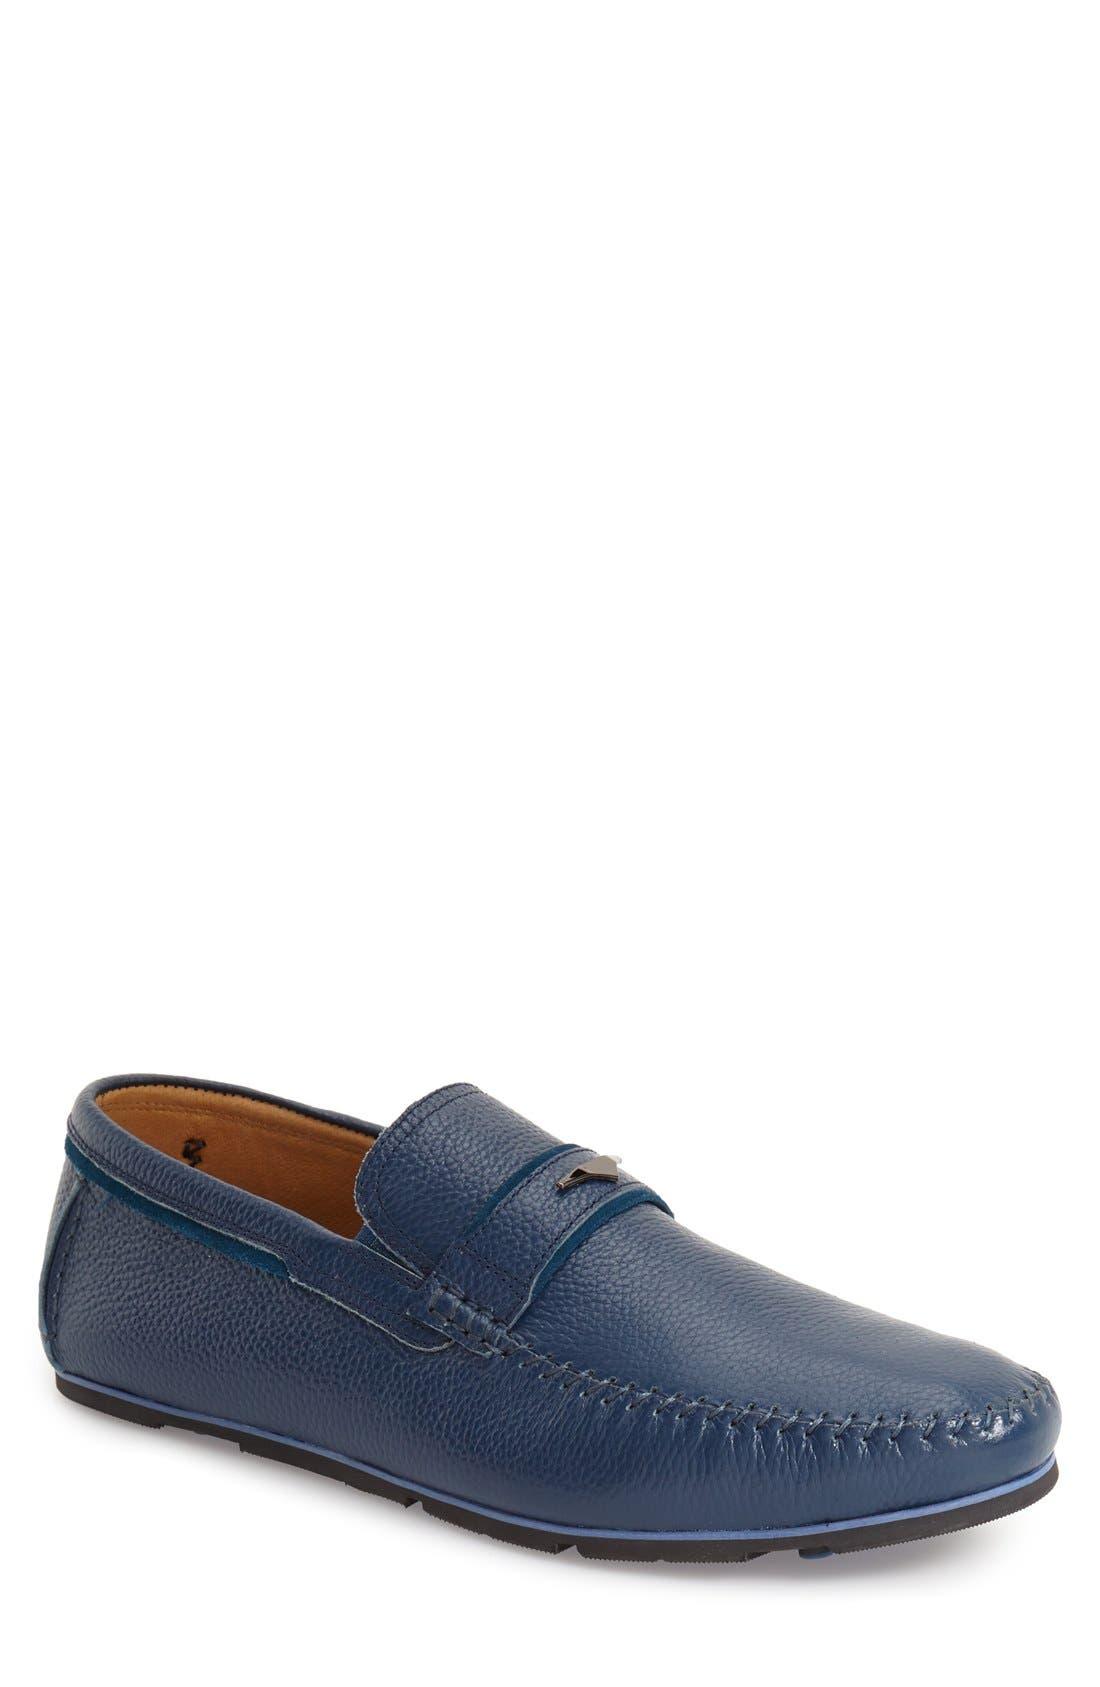 Alternate Image 1 Selected - Zanzara Leather Loafer (Men)